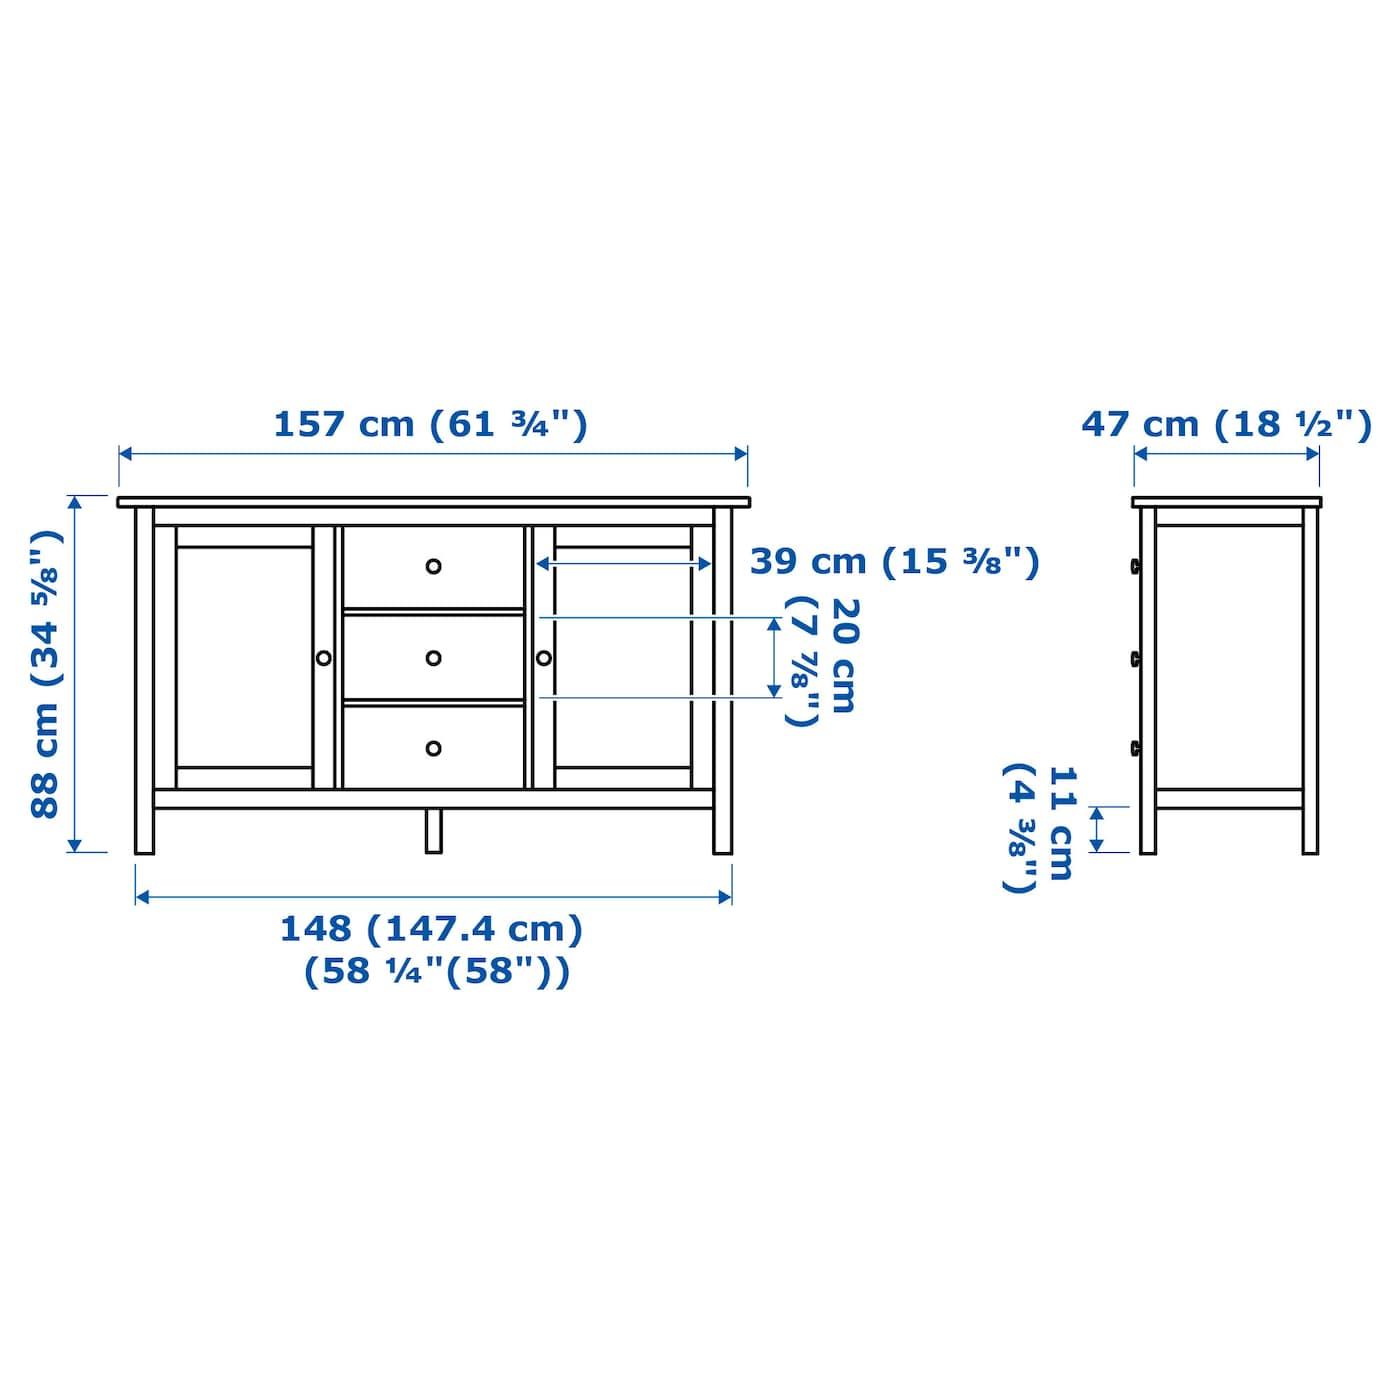 hemnes sideboard white stain 157 x 88 cm - ikea